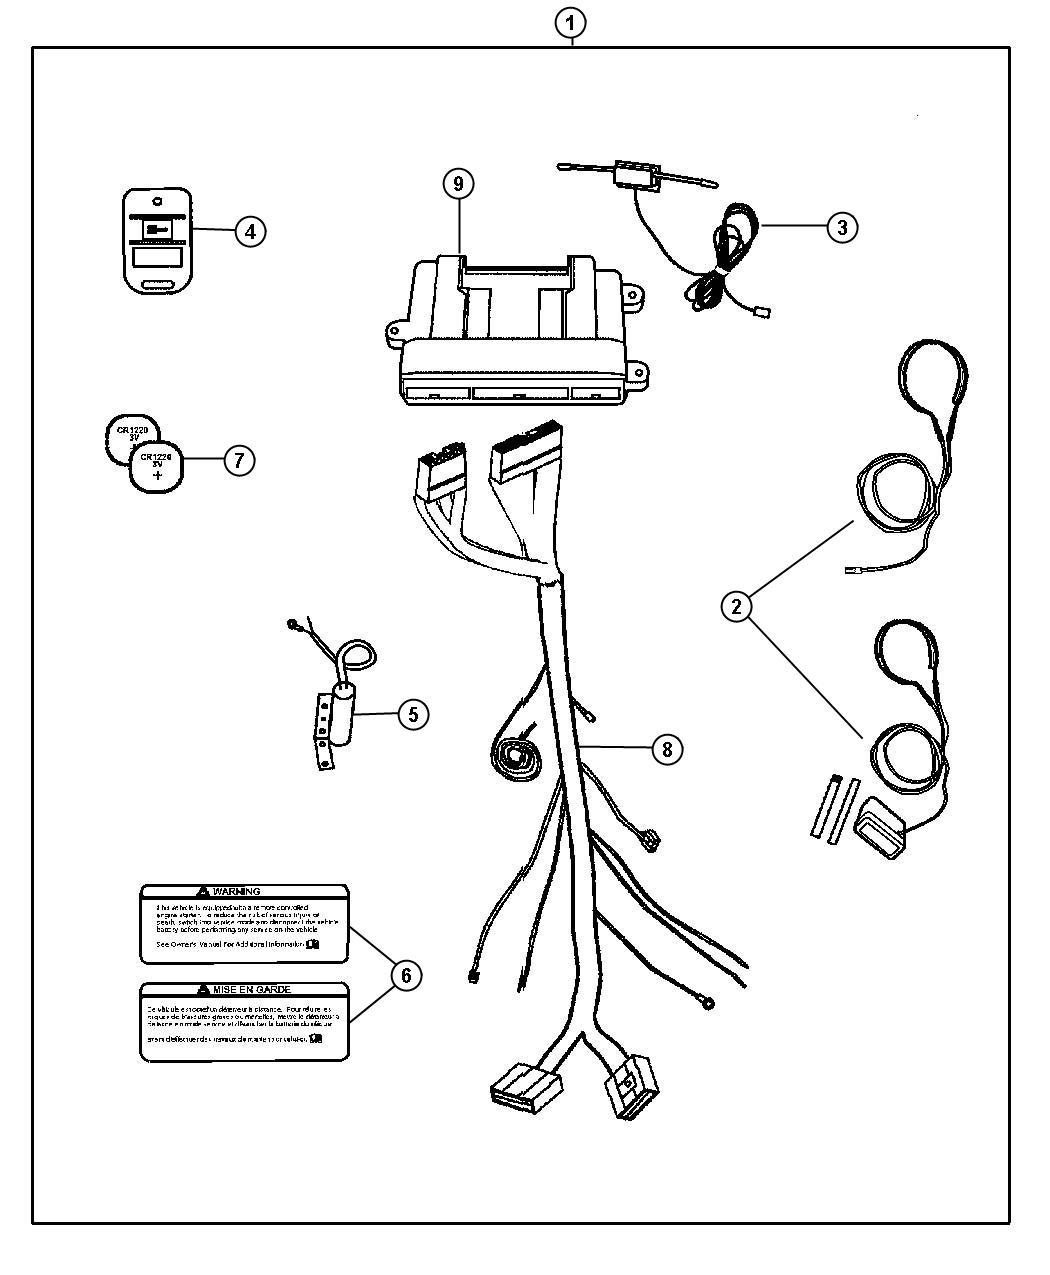 Jeep Liberty Transmitter. Remote, kit, installation